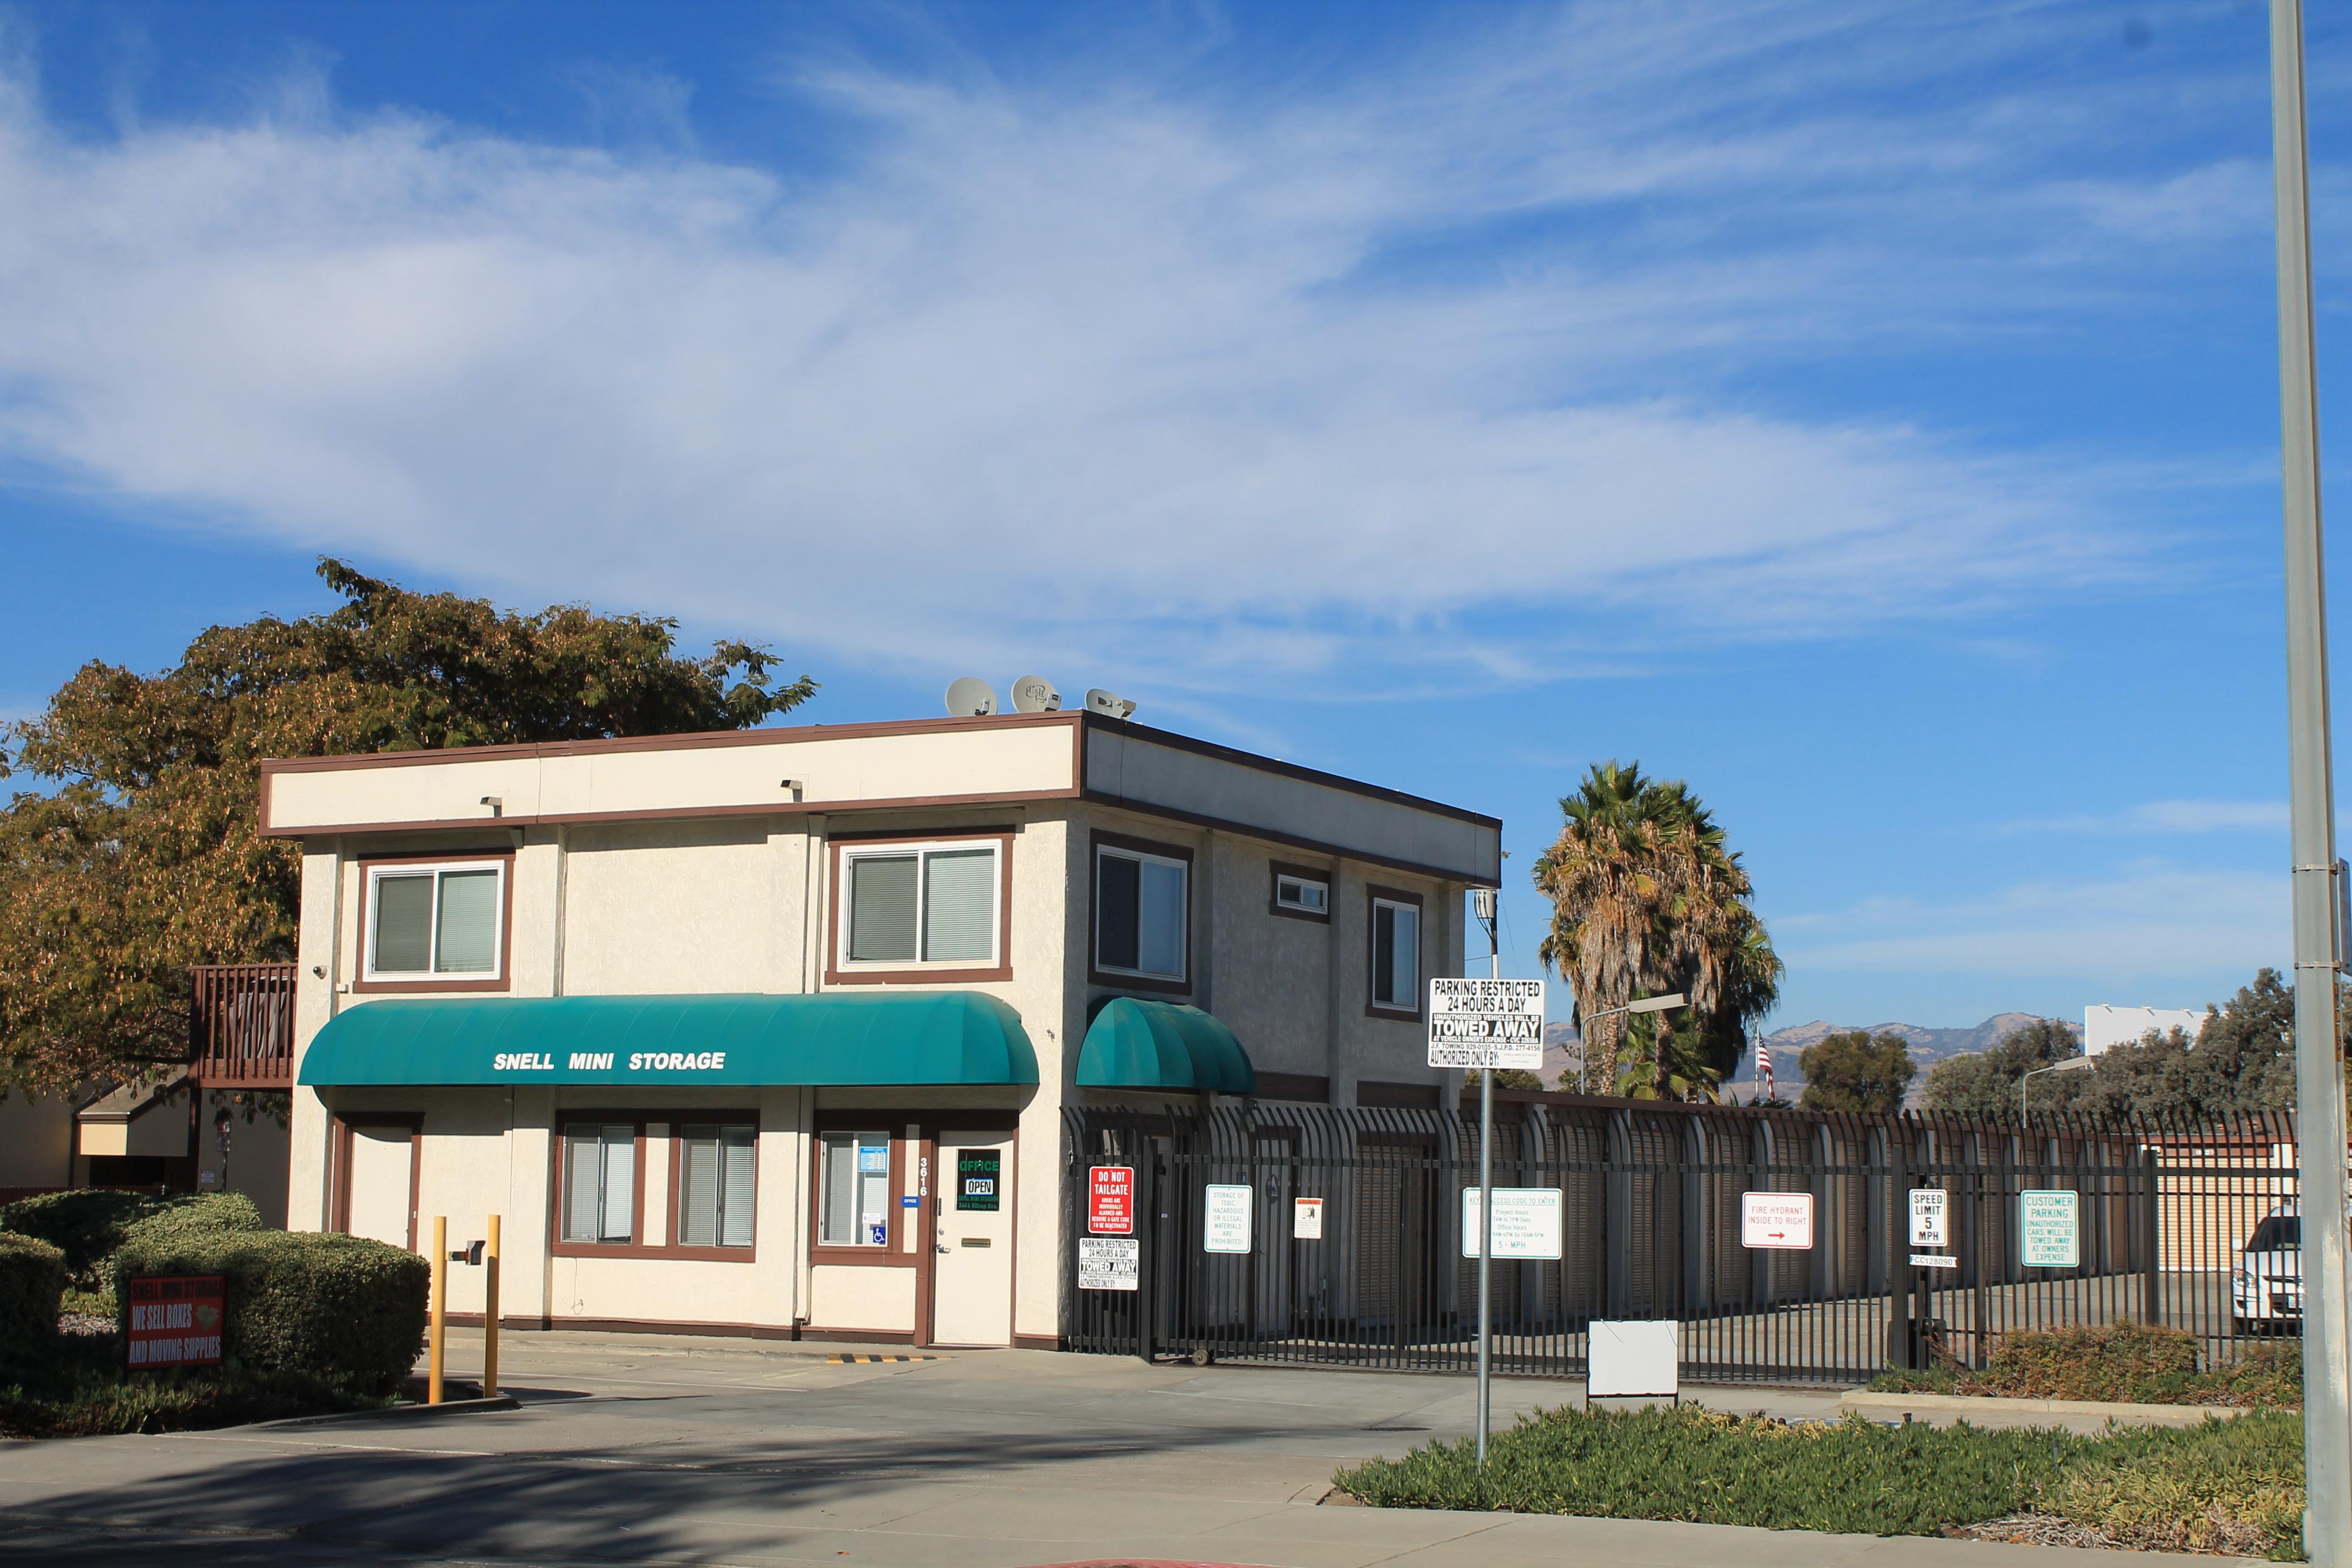 Round Table Capitol Expressway Snell Mini Storage San Jose Ca 95136 Ypcom